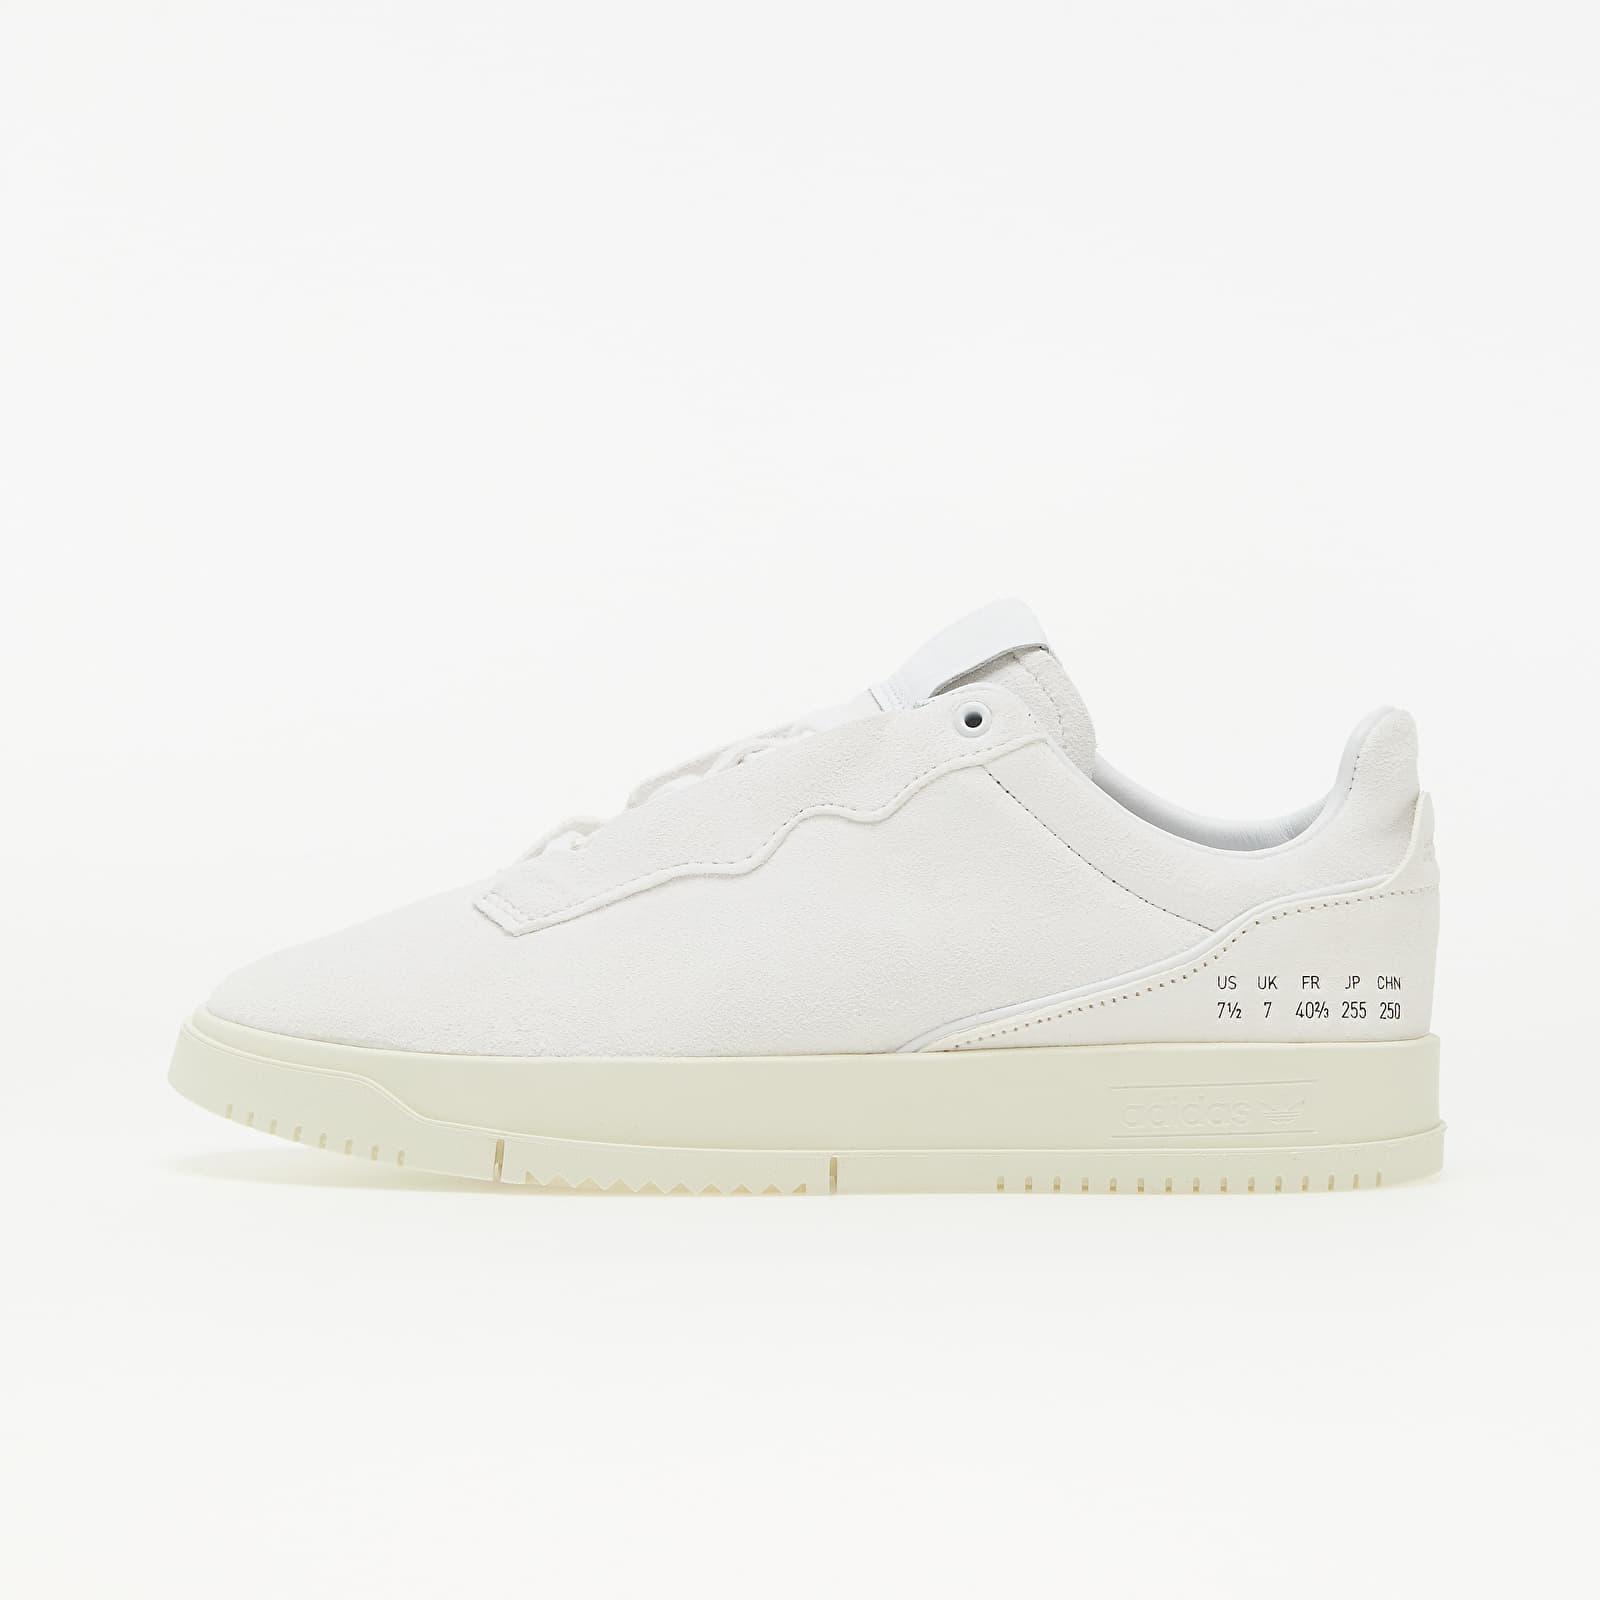 adidas Supercourt Premium Supplier Color/ Ftw White/ Off White FY5473